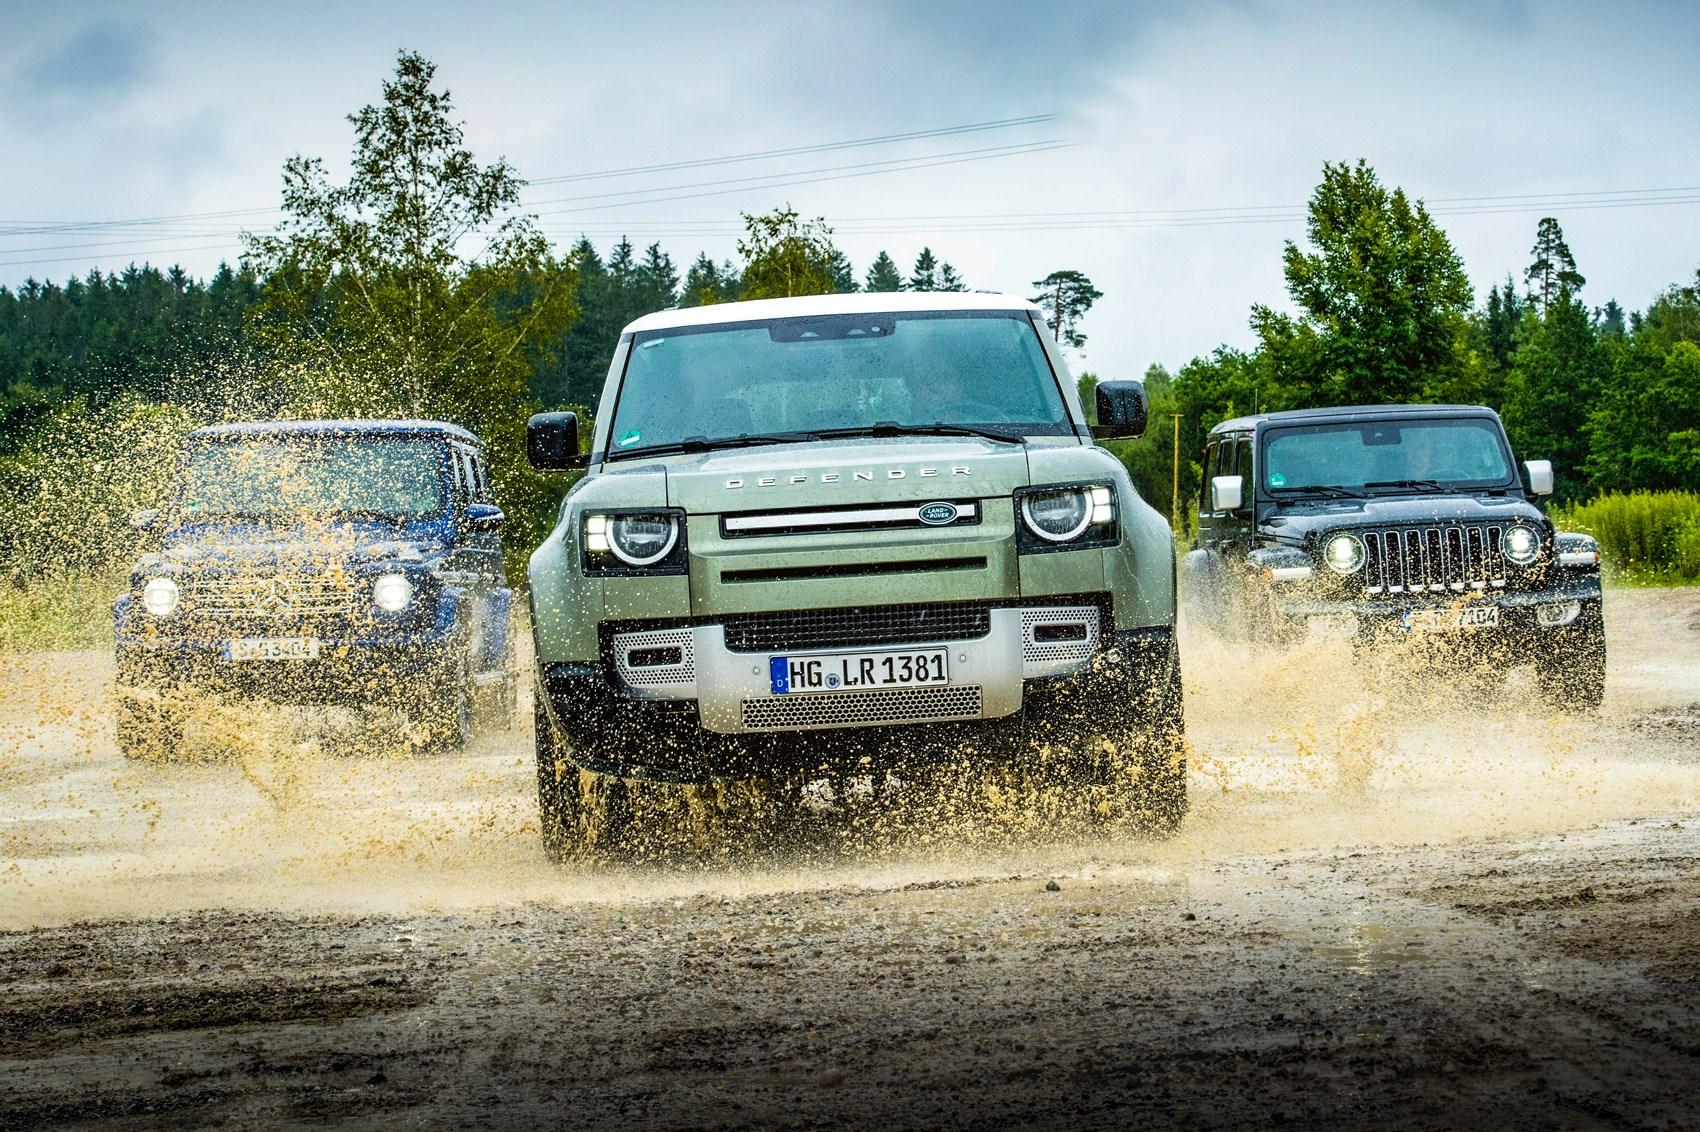 Land Rover Defender vs Jeep Wrangler vs Mercedes G-Class group test review